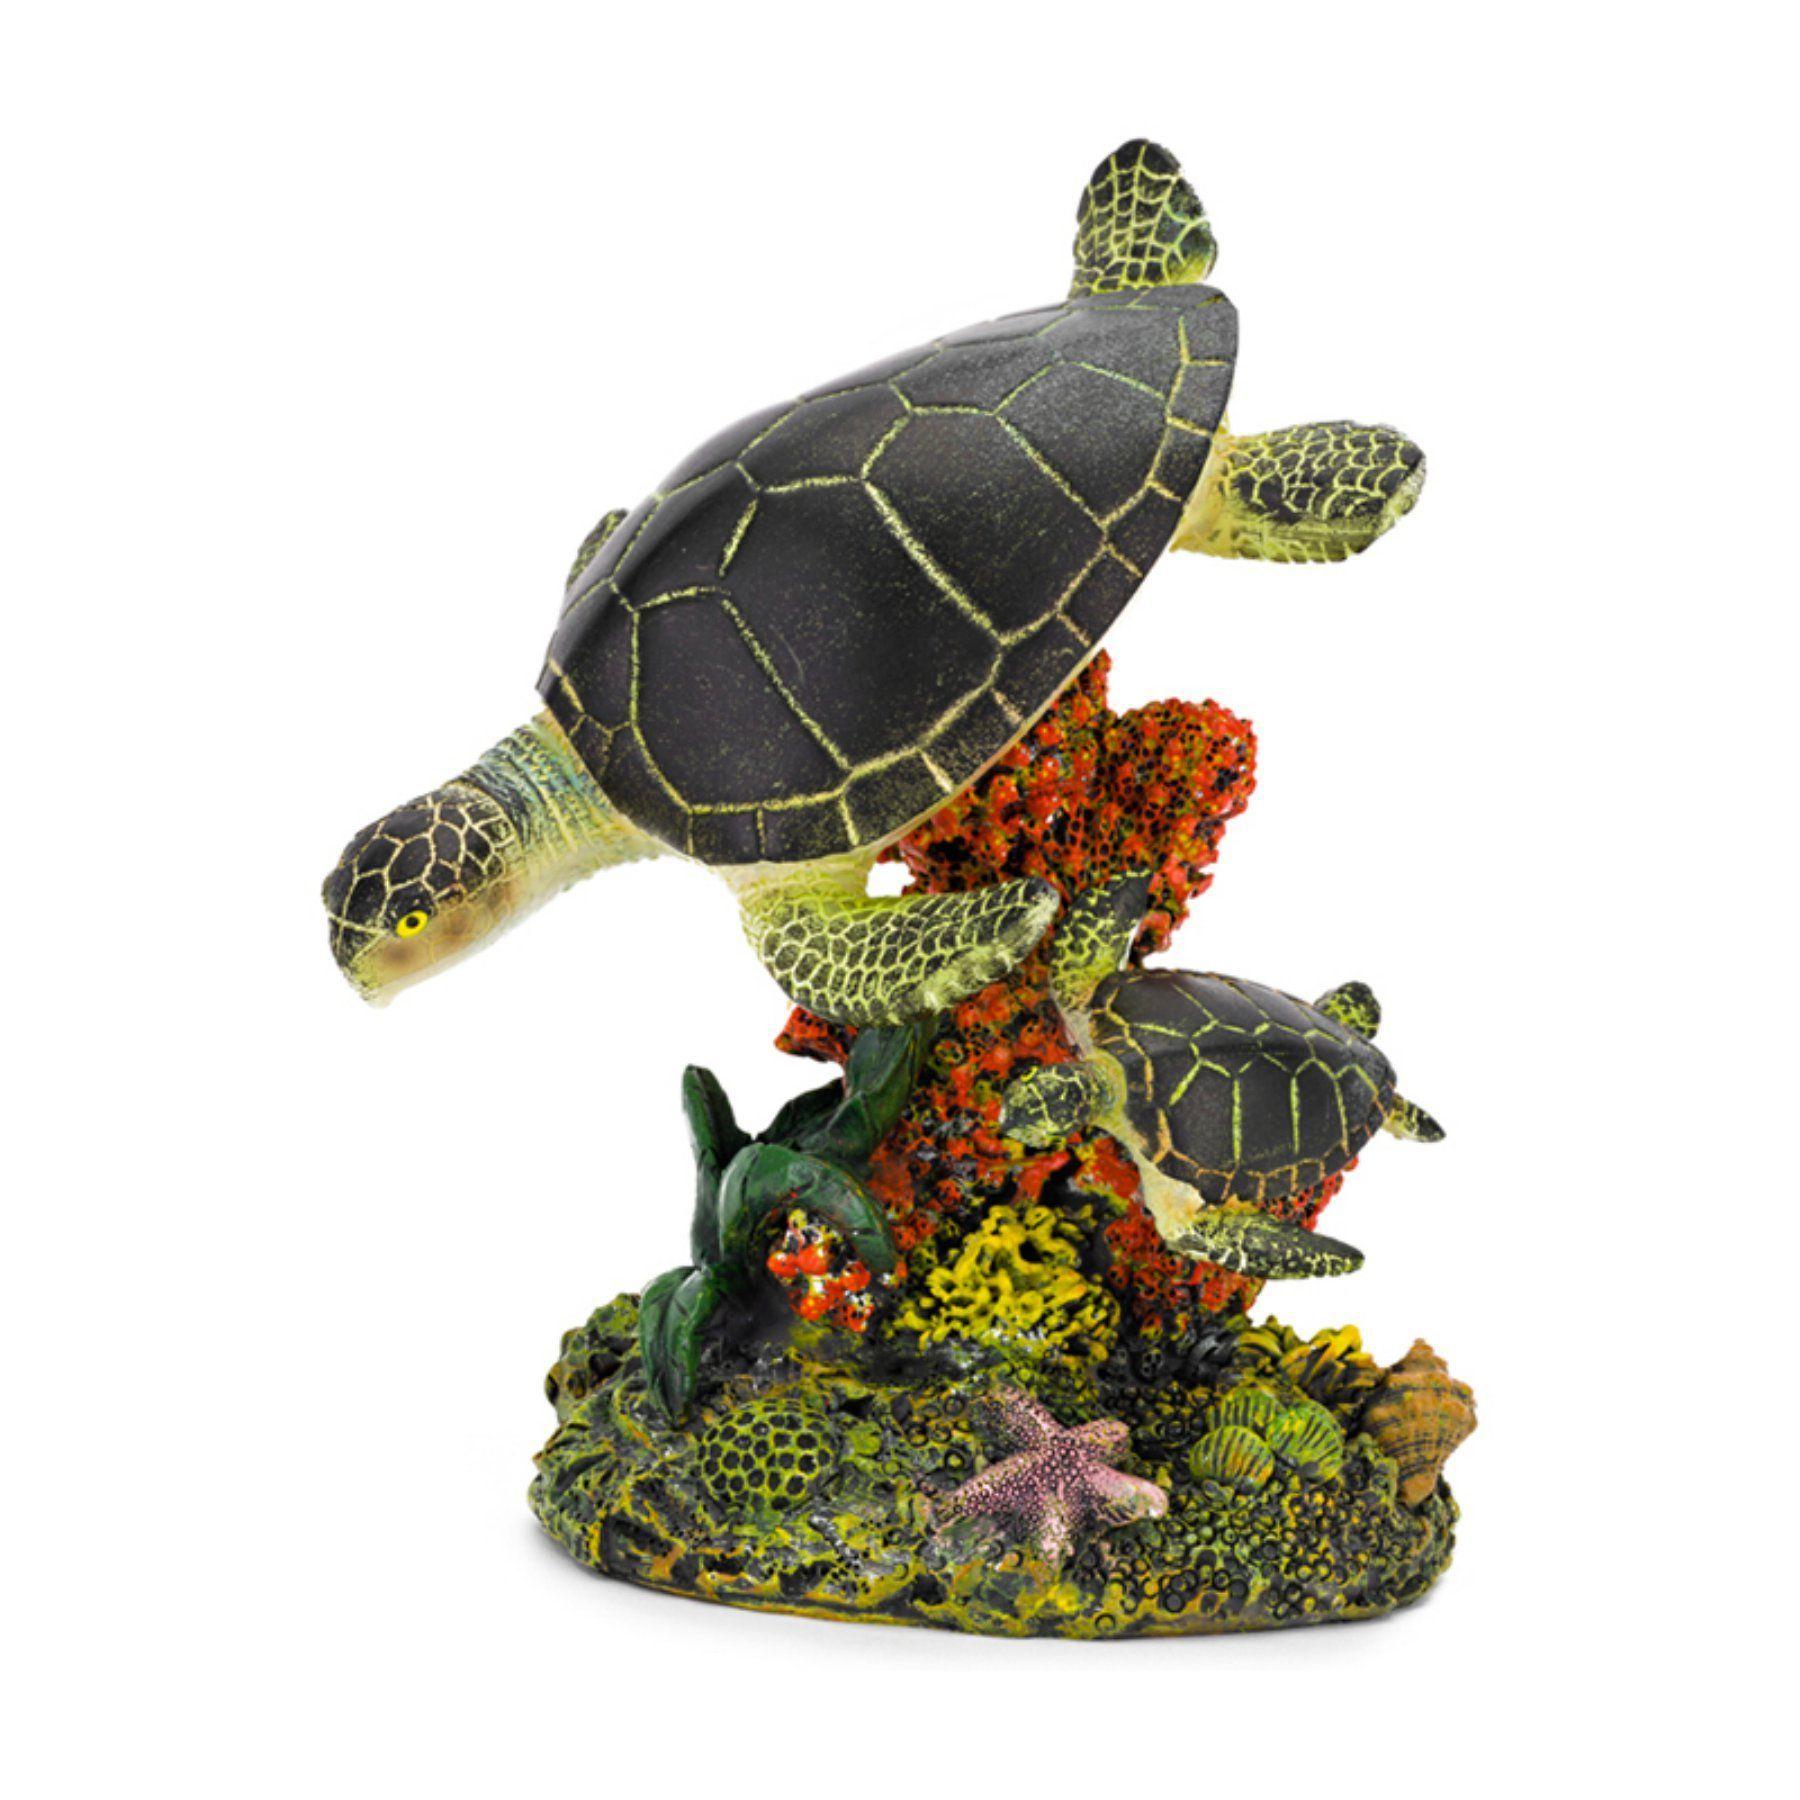 Penn plax swimming sea turtles aquarium figure medium l x h